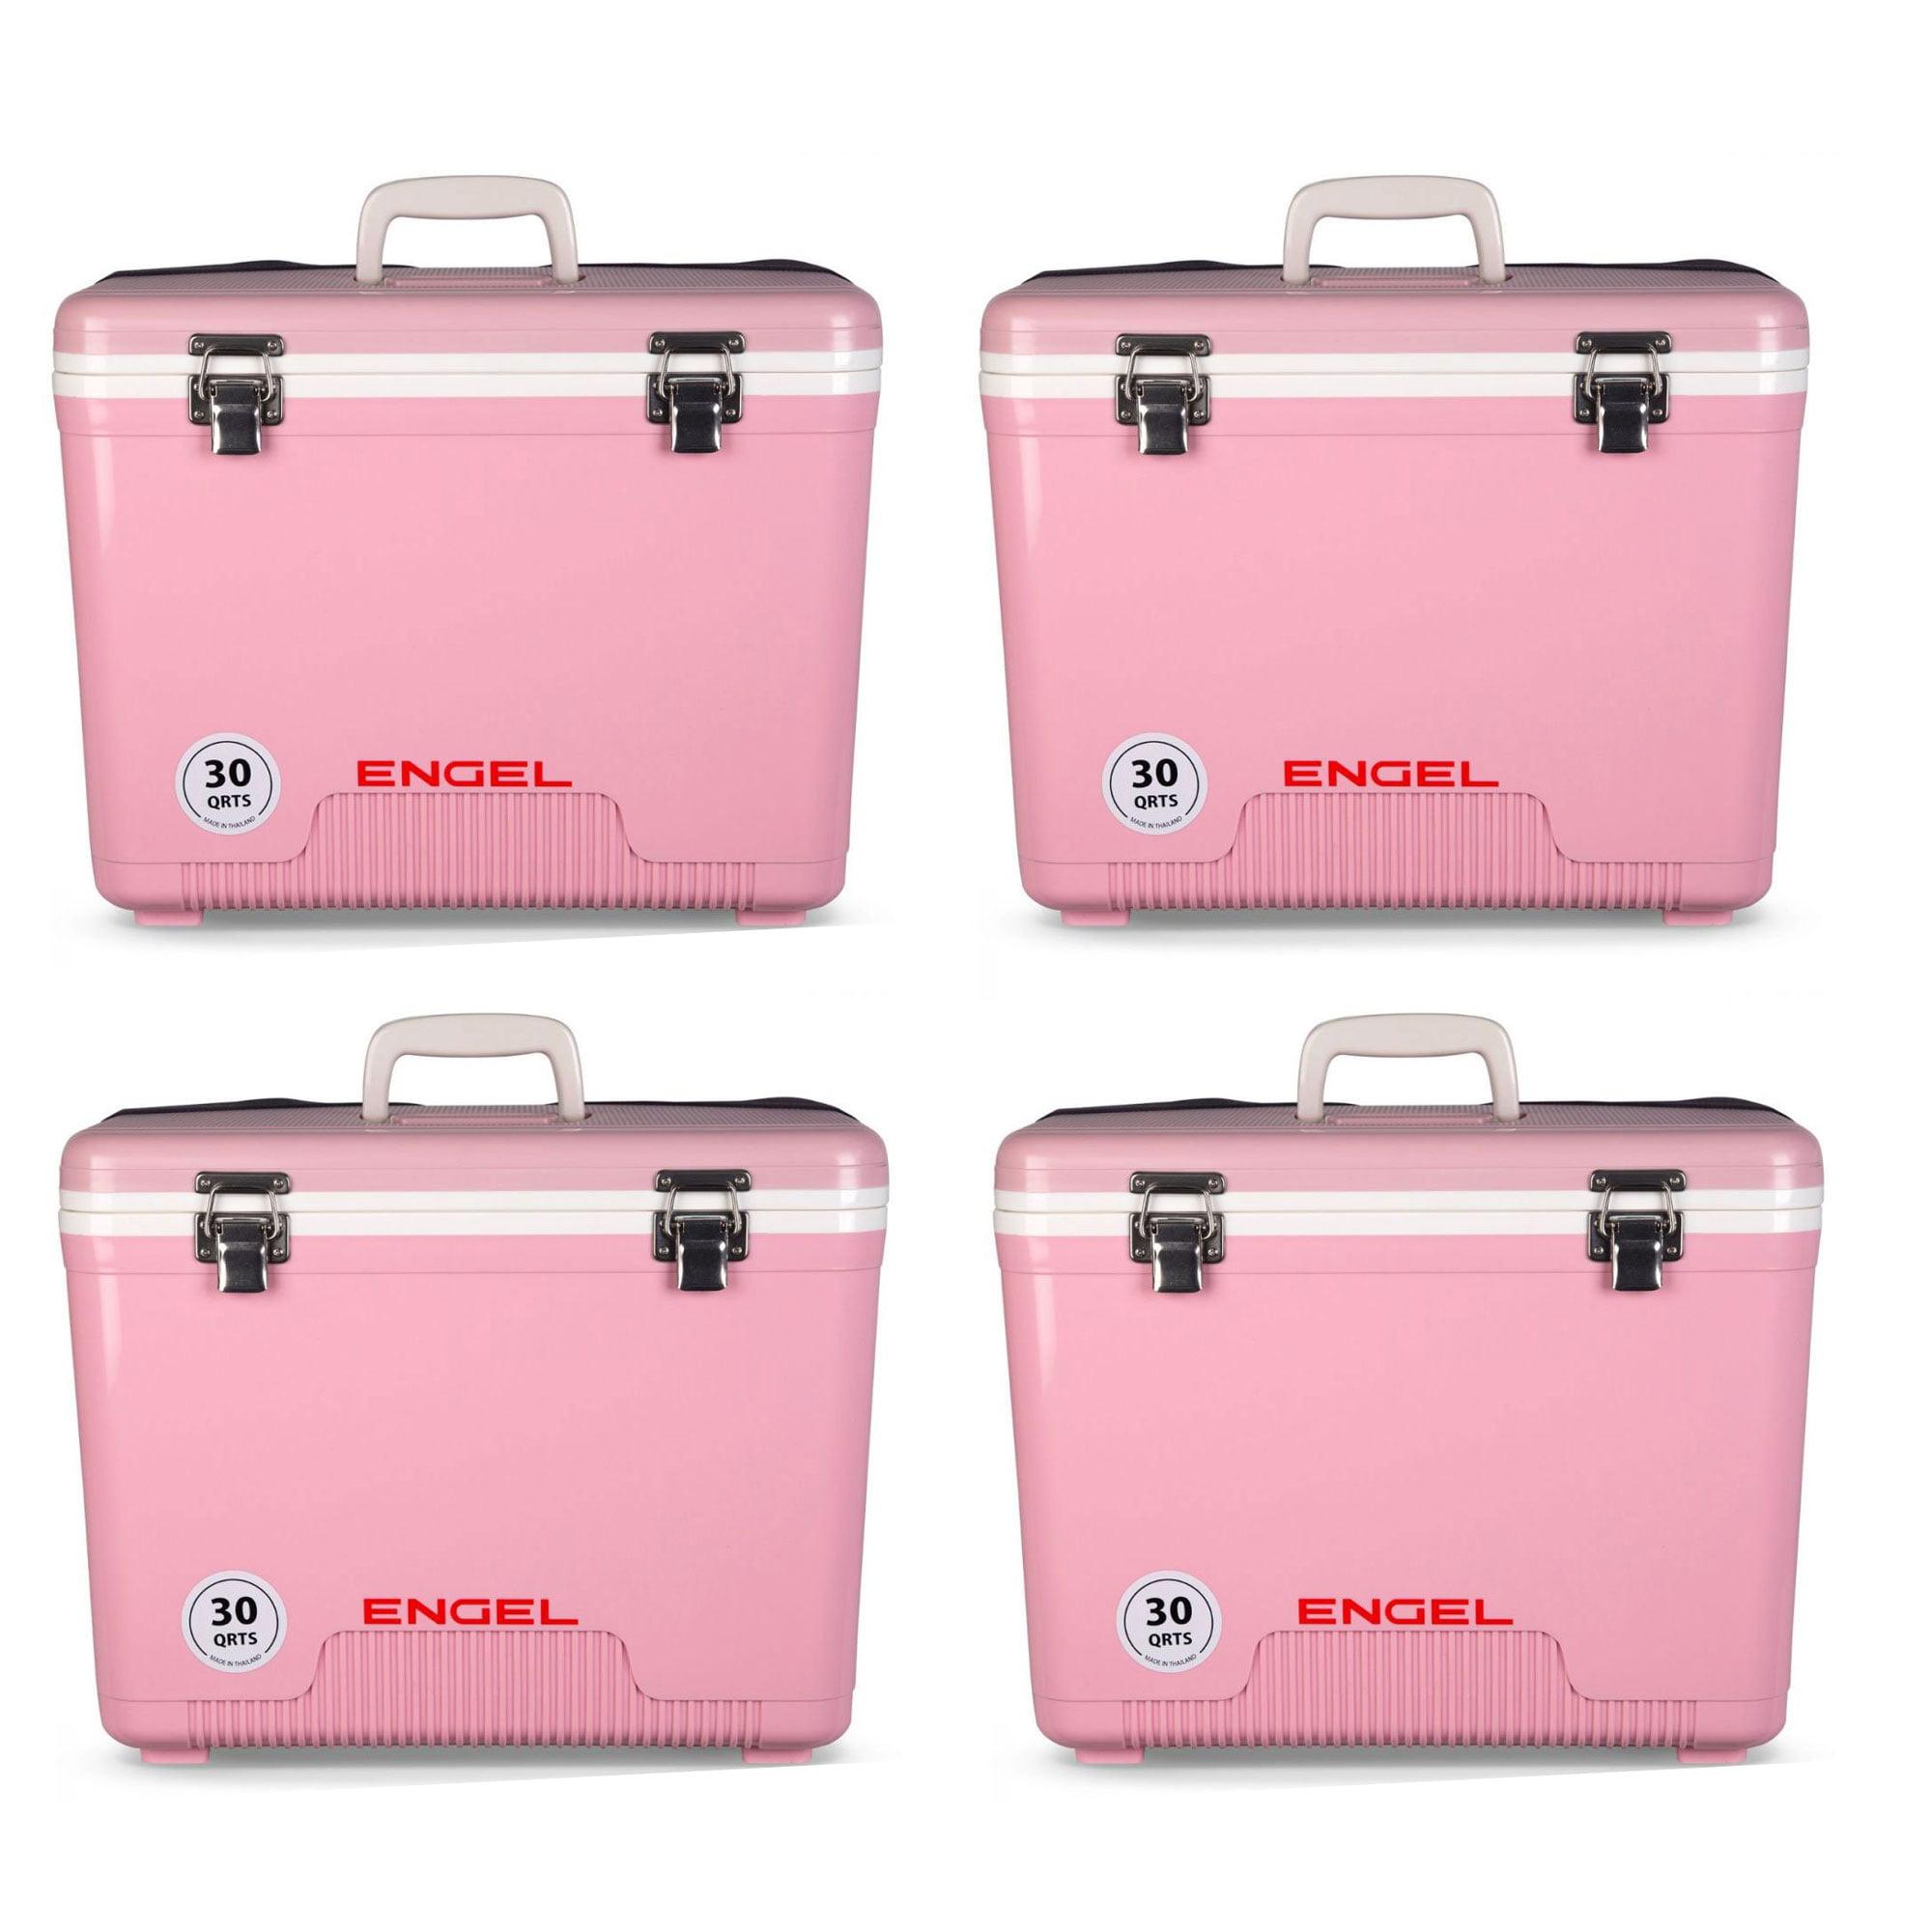 Engel Coolers 30 Quart 48 Can Lightweight Insulated Cooler Drybox, Pink (4 Pack)